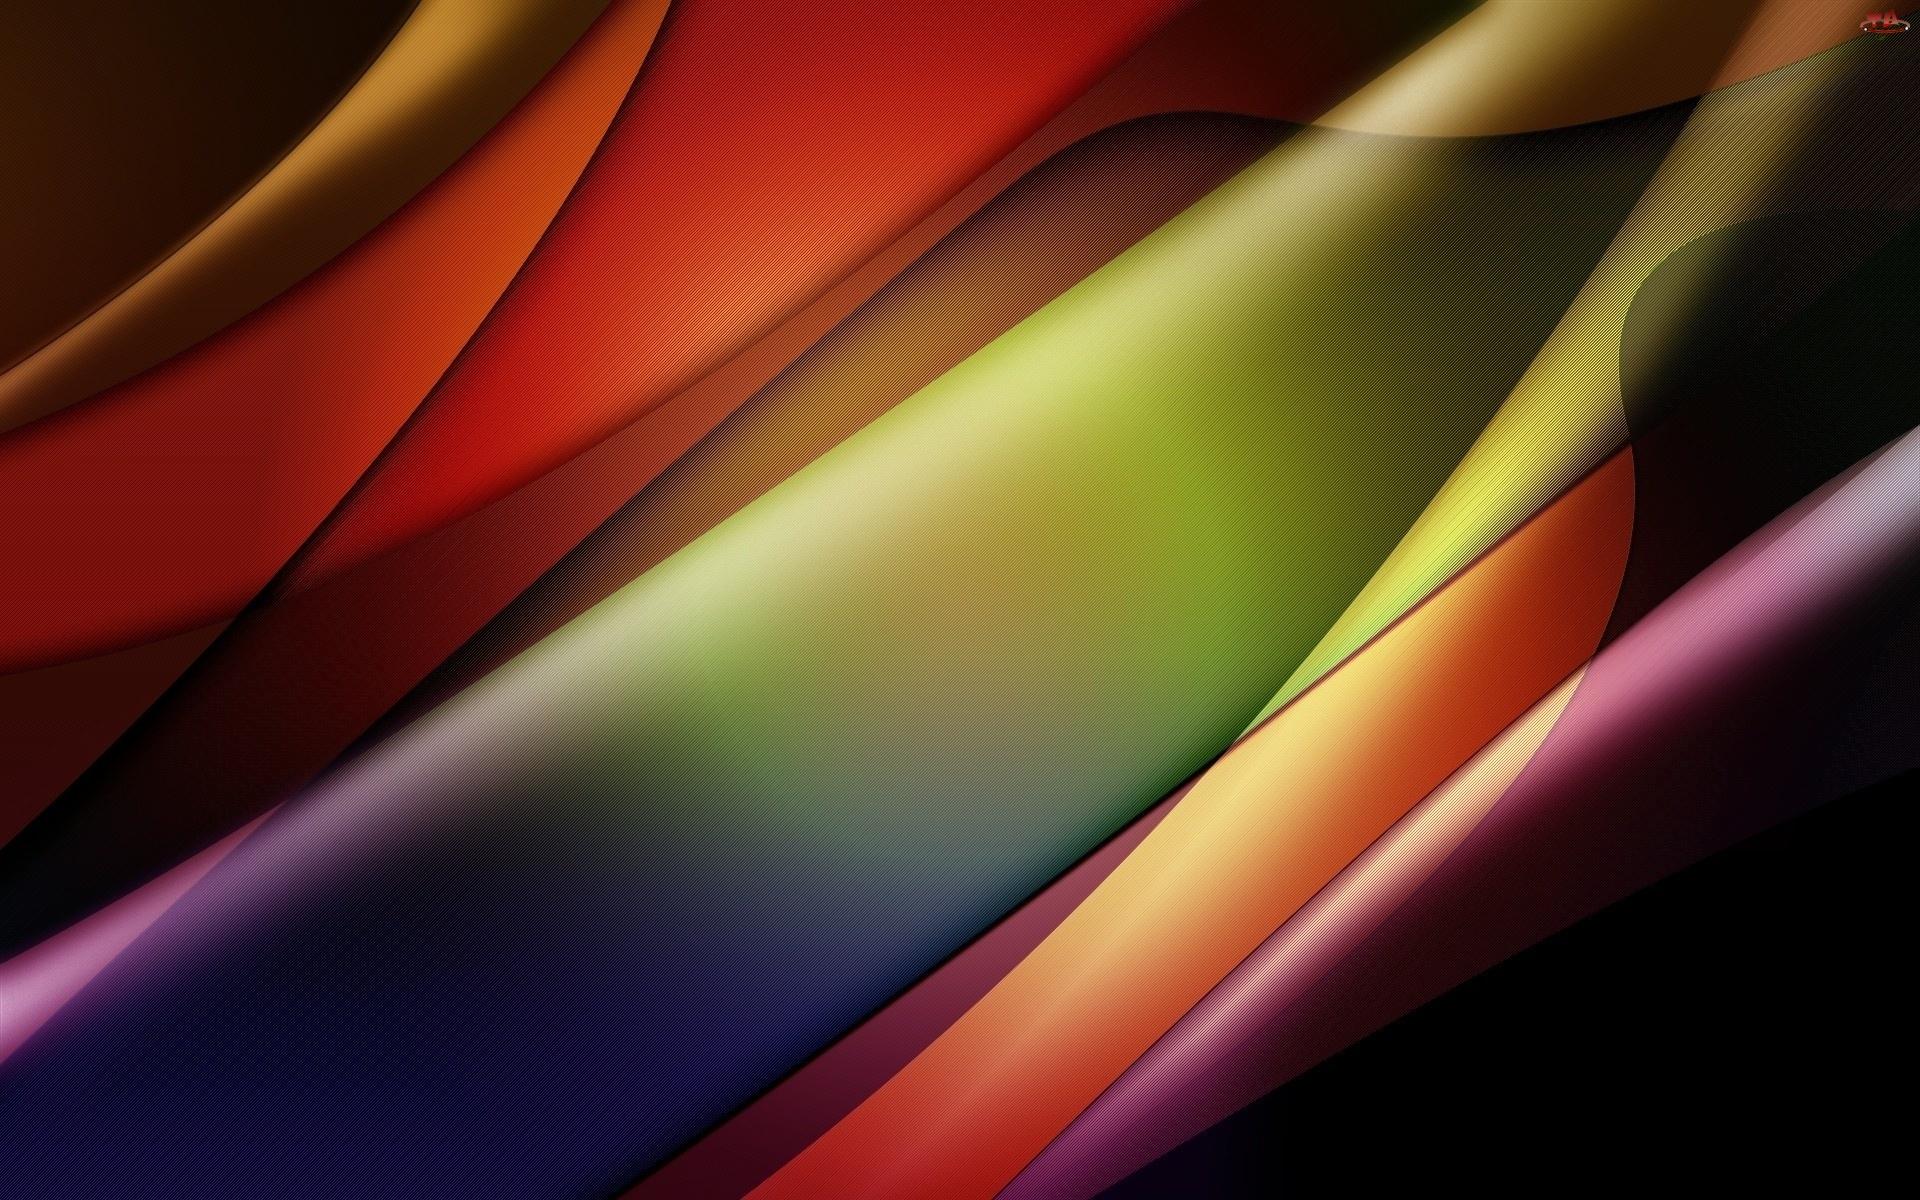 Kolorowe, Grafika, Tło, Tekstura